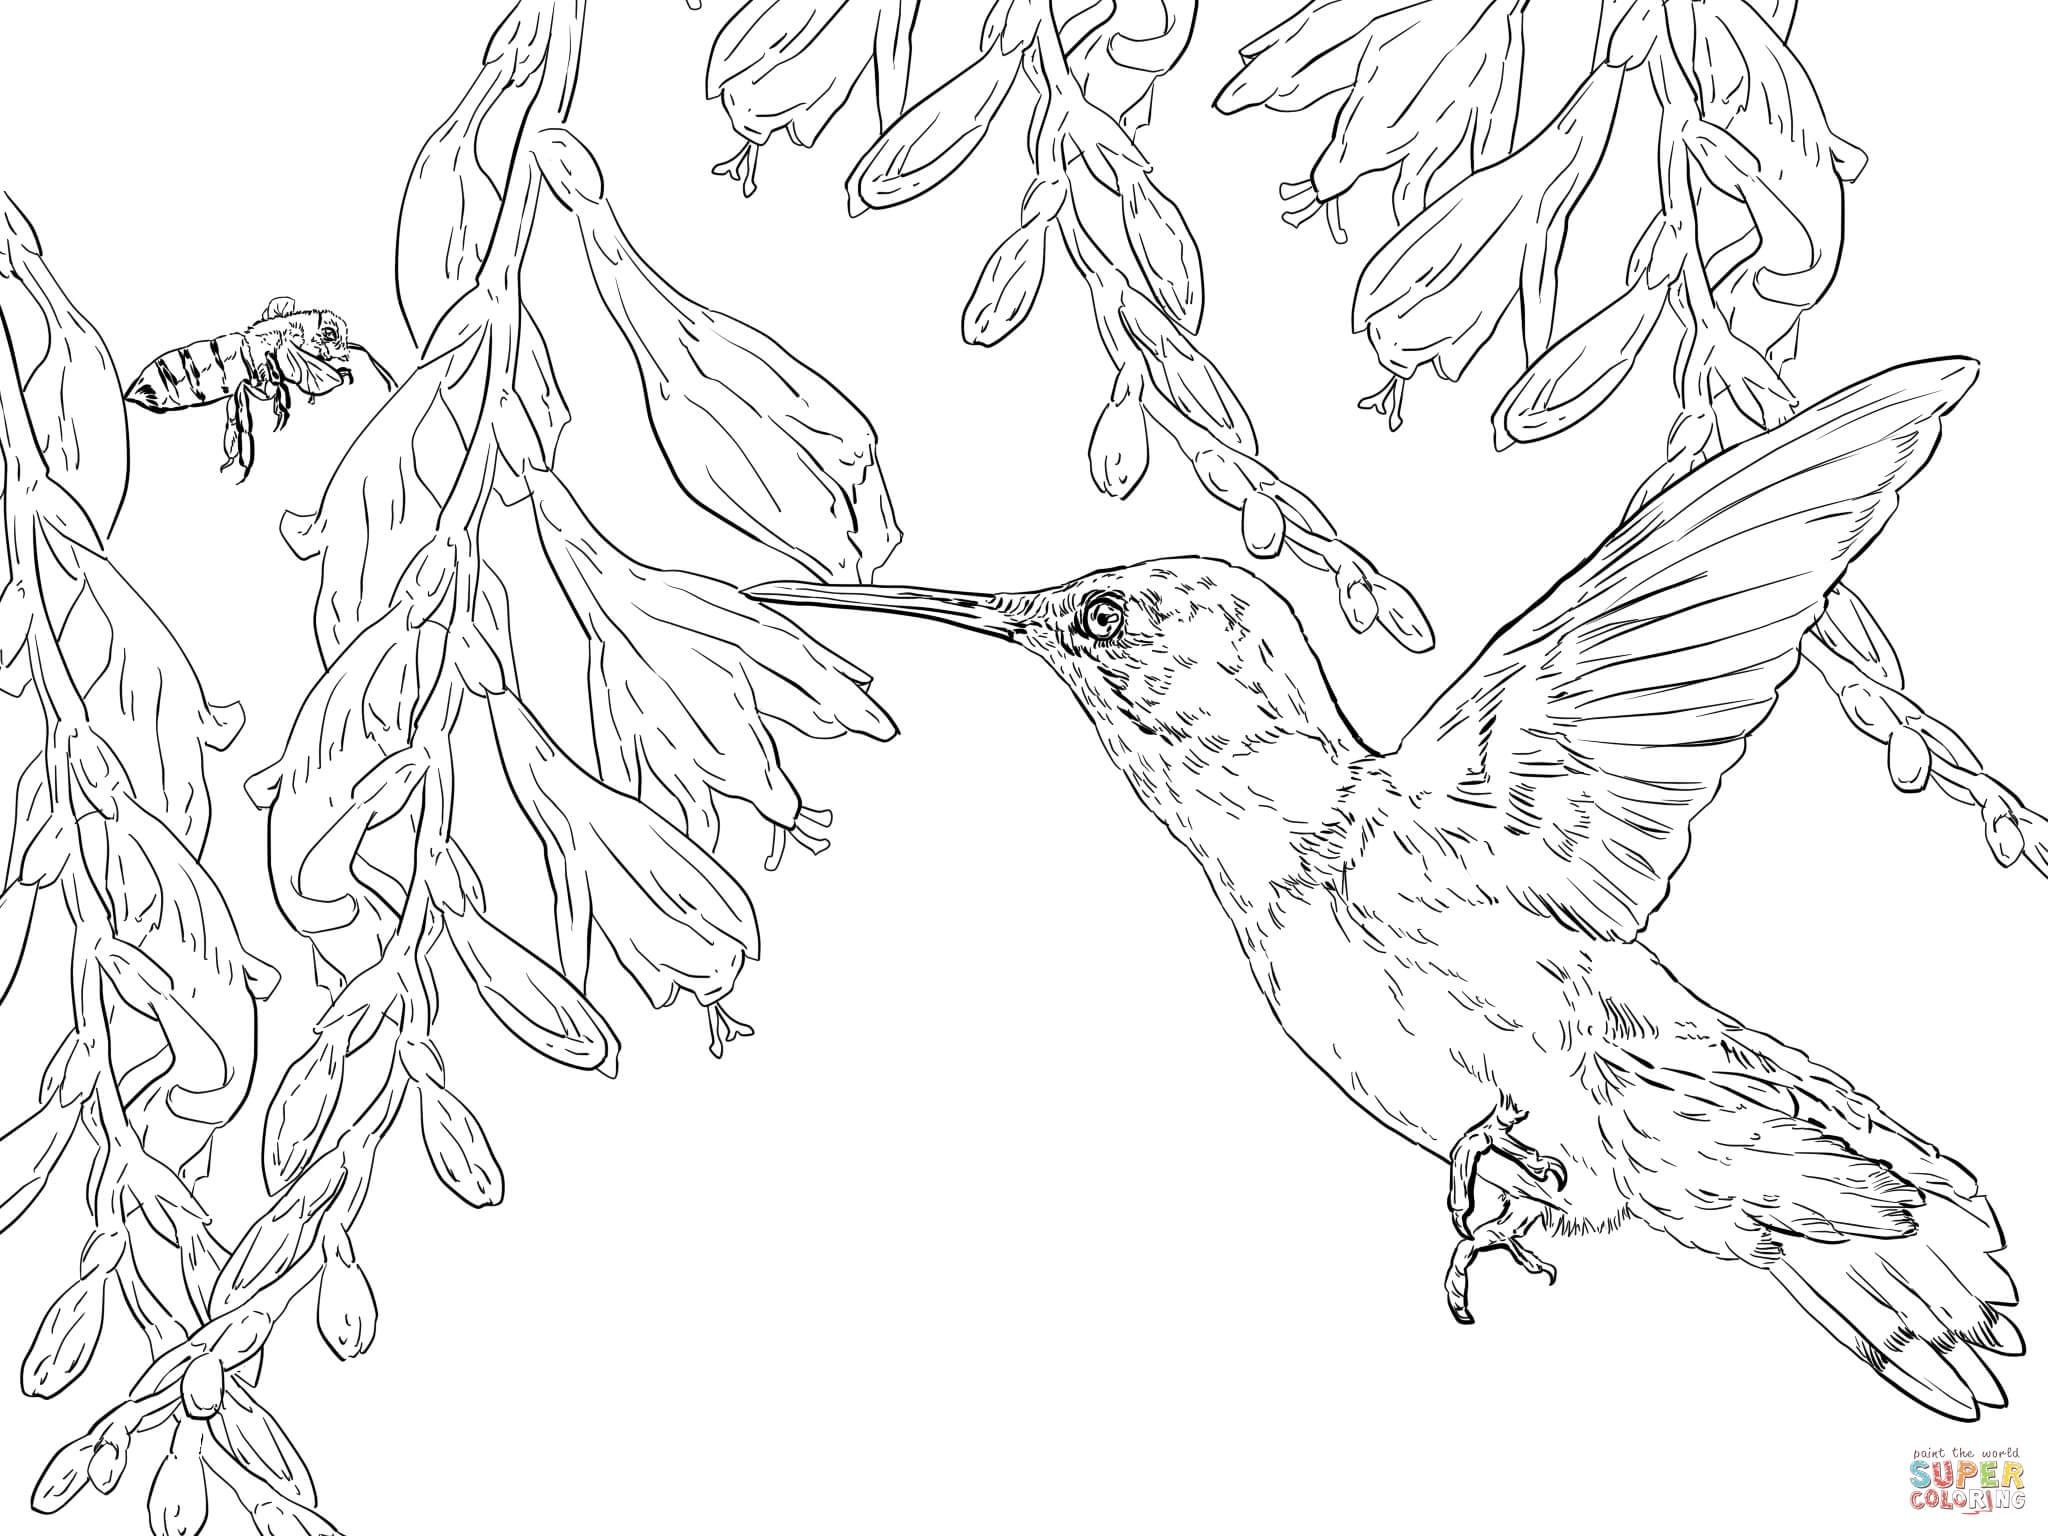 Bee Hummingbird Coloring Page | Free Printable Coloring Pages - Free Printable Pictures Of Hummingbirds